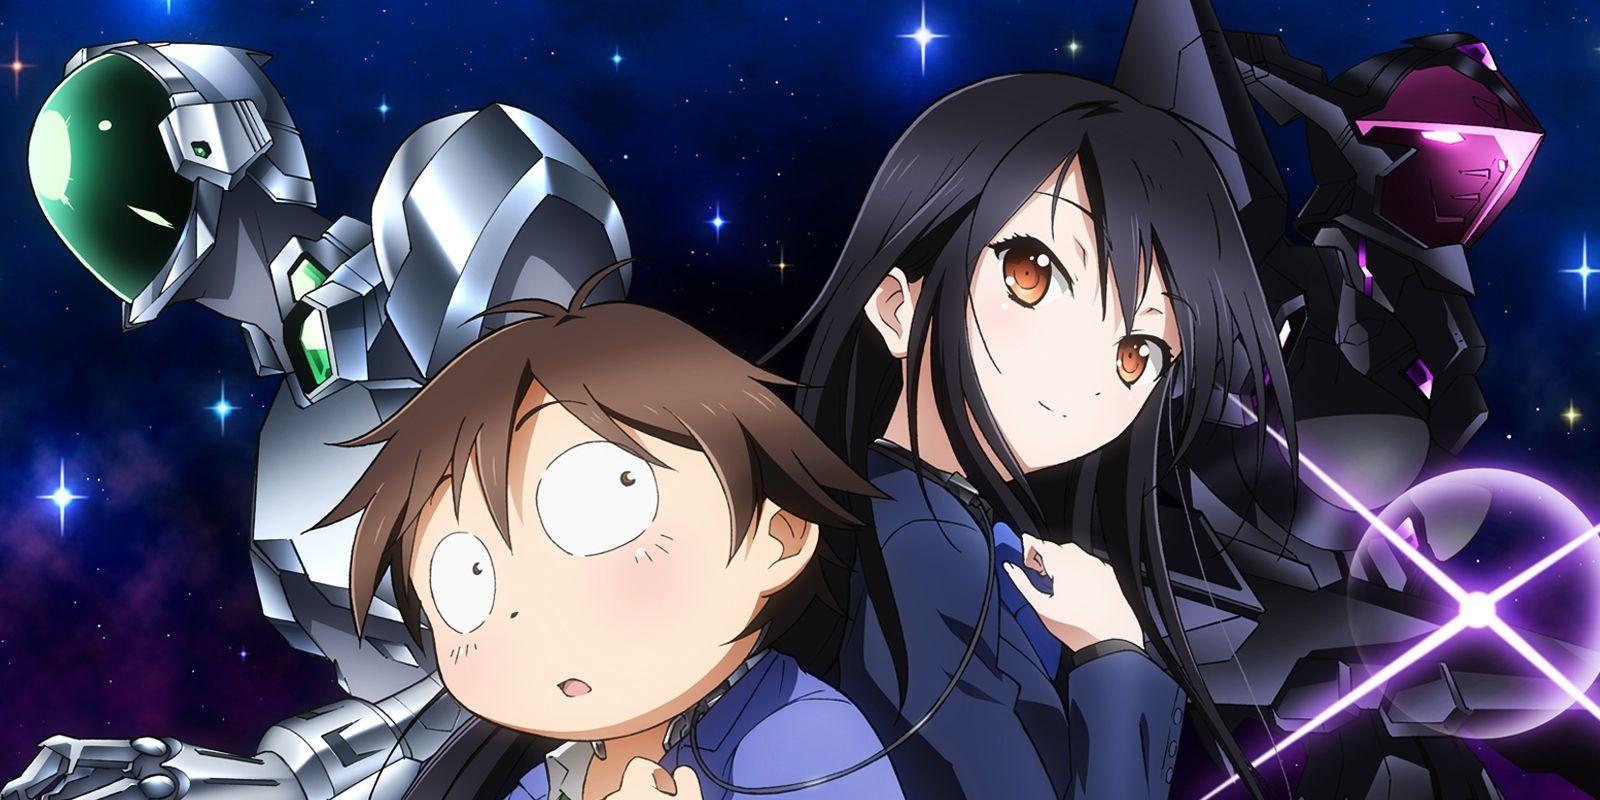 Accel world anime